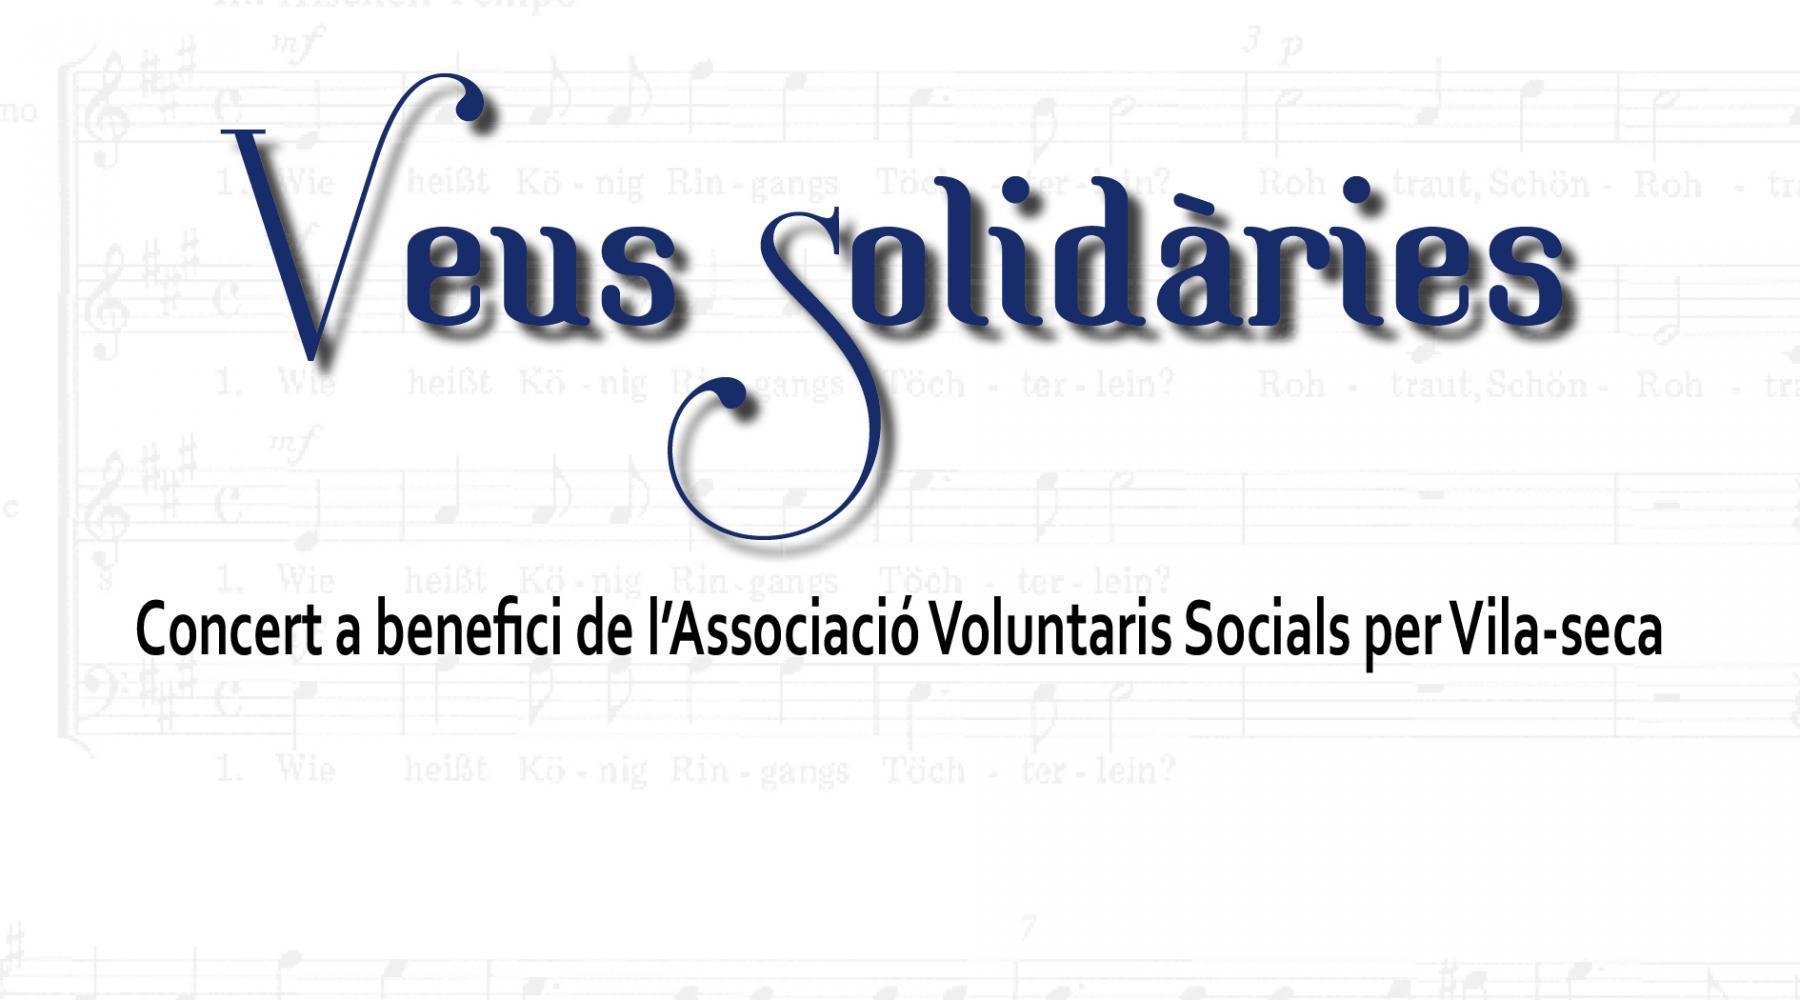 Veus Solidàries